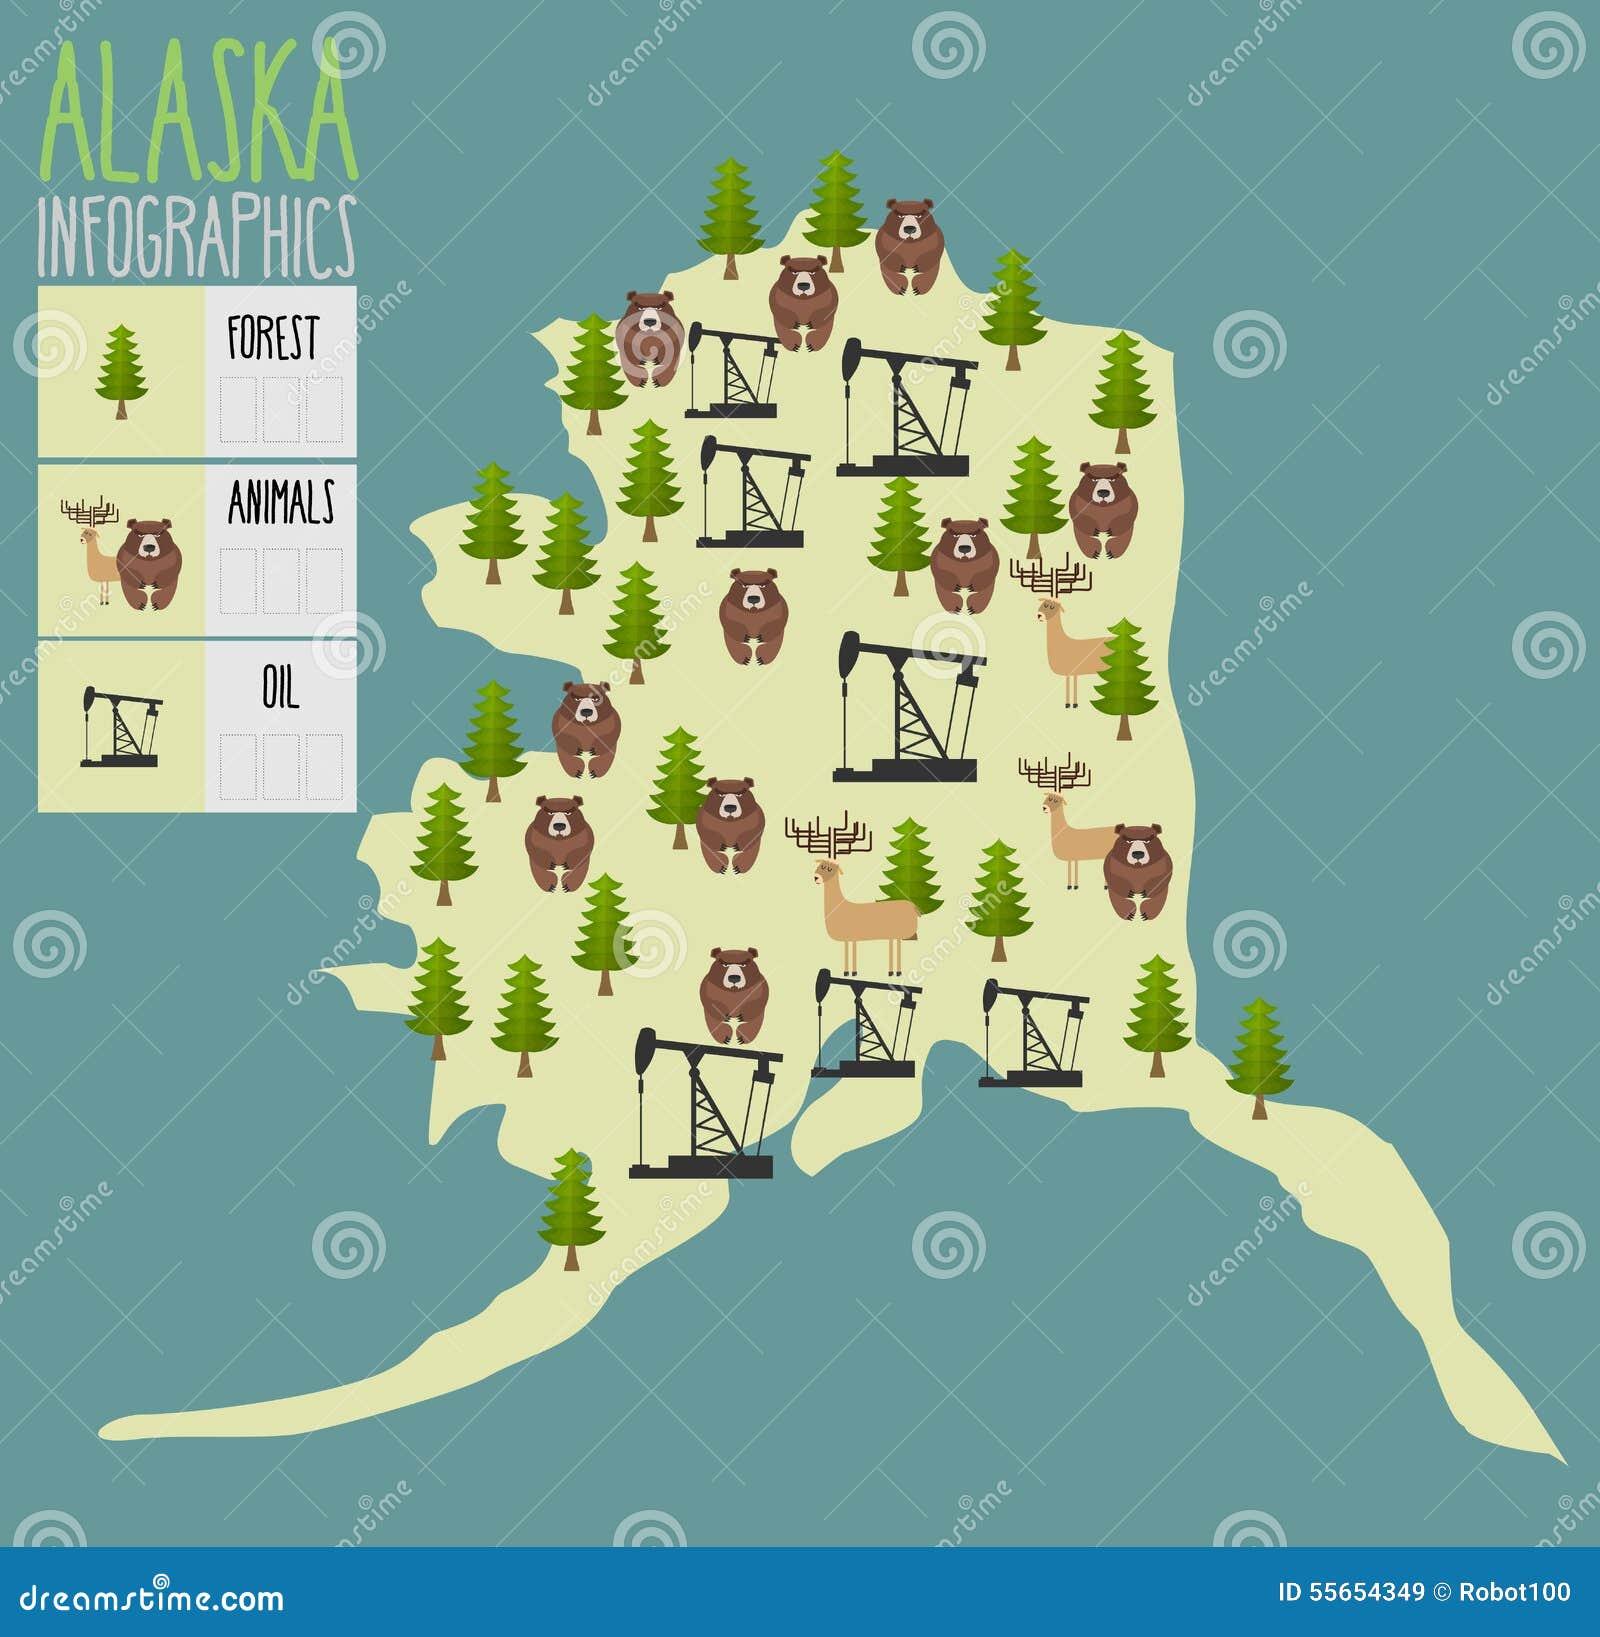 Natural Resources S Alaska Oil